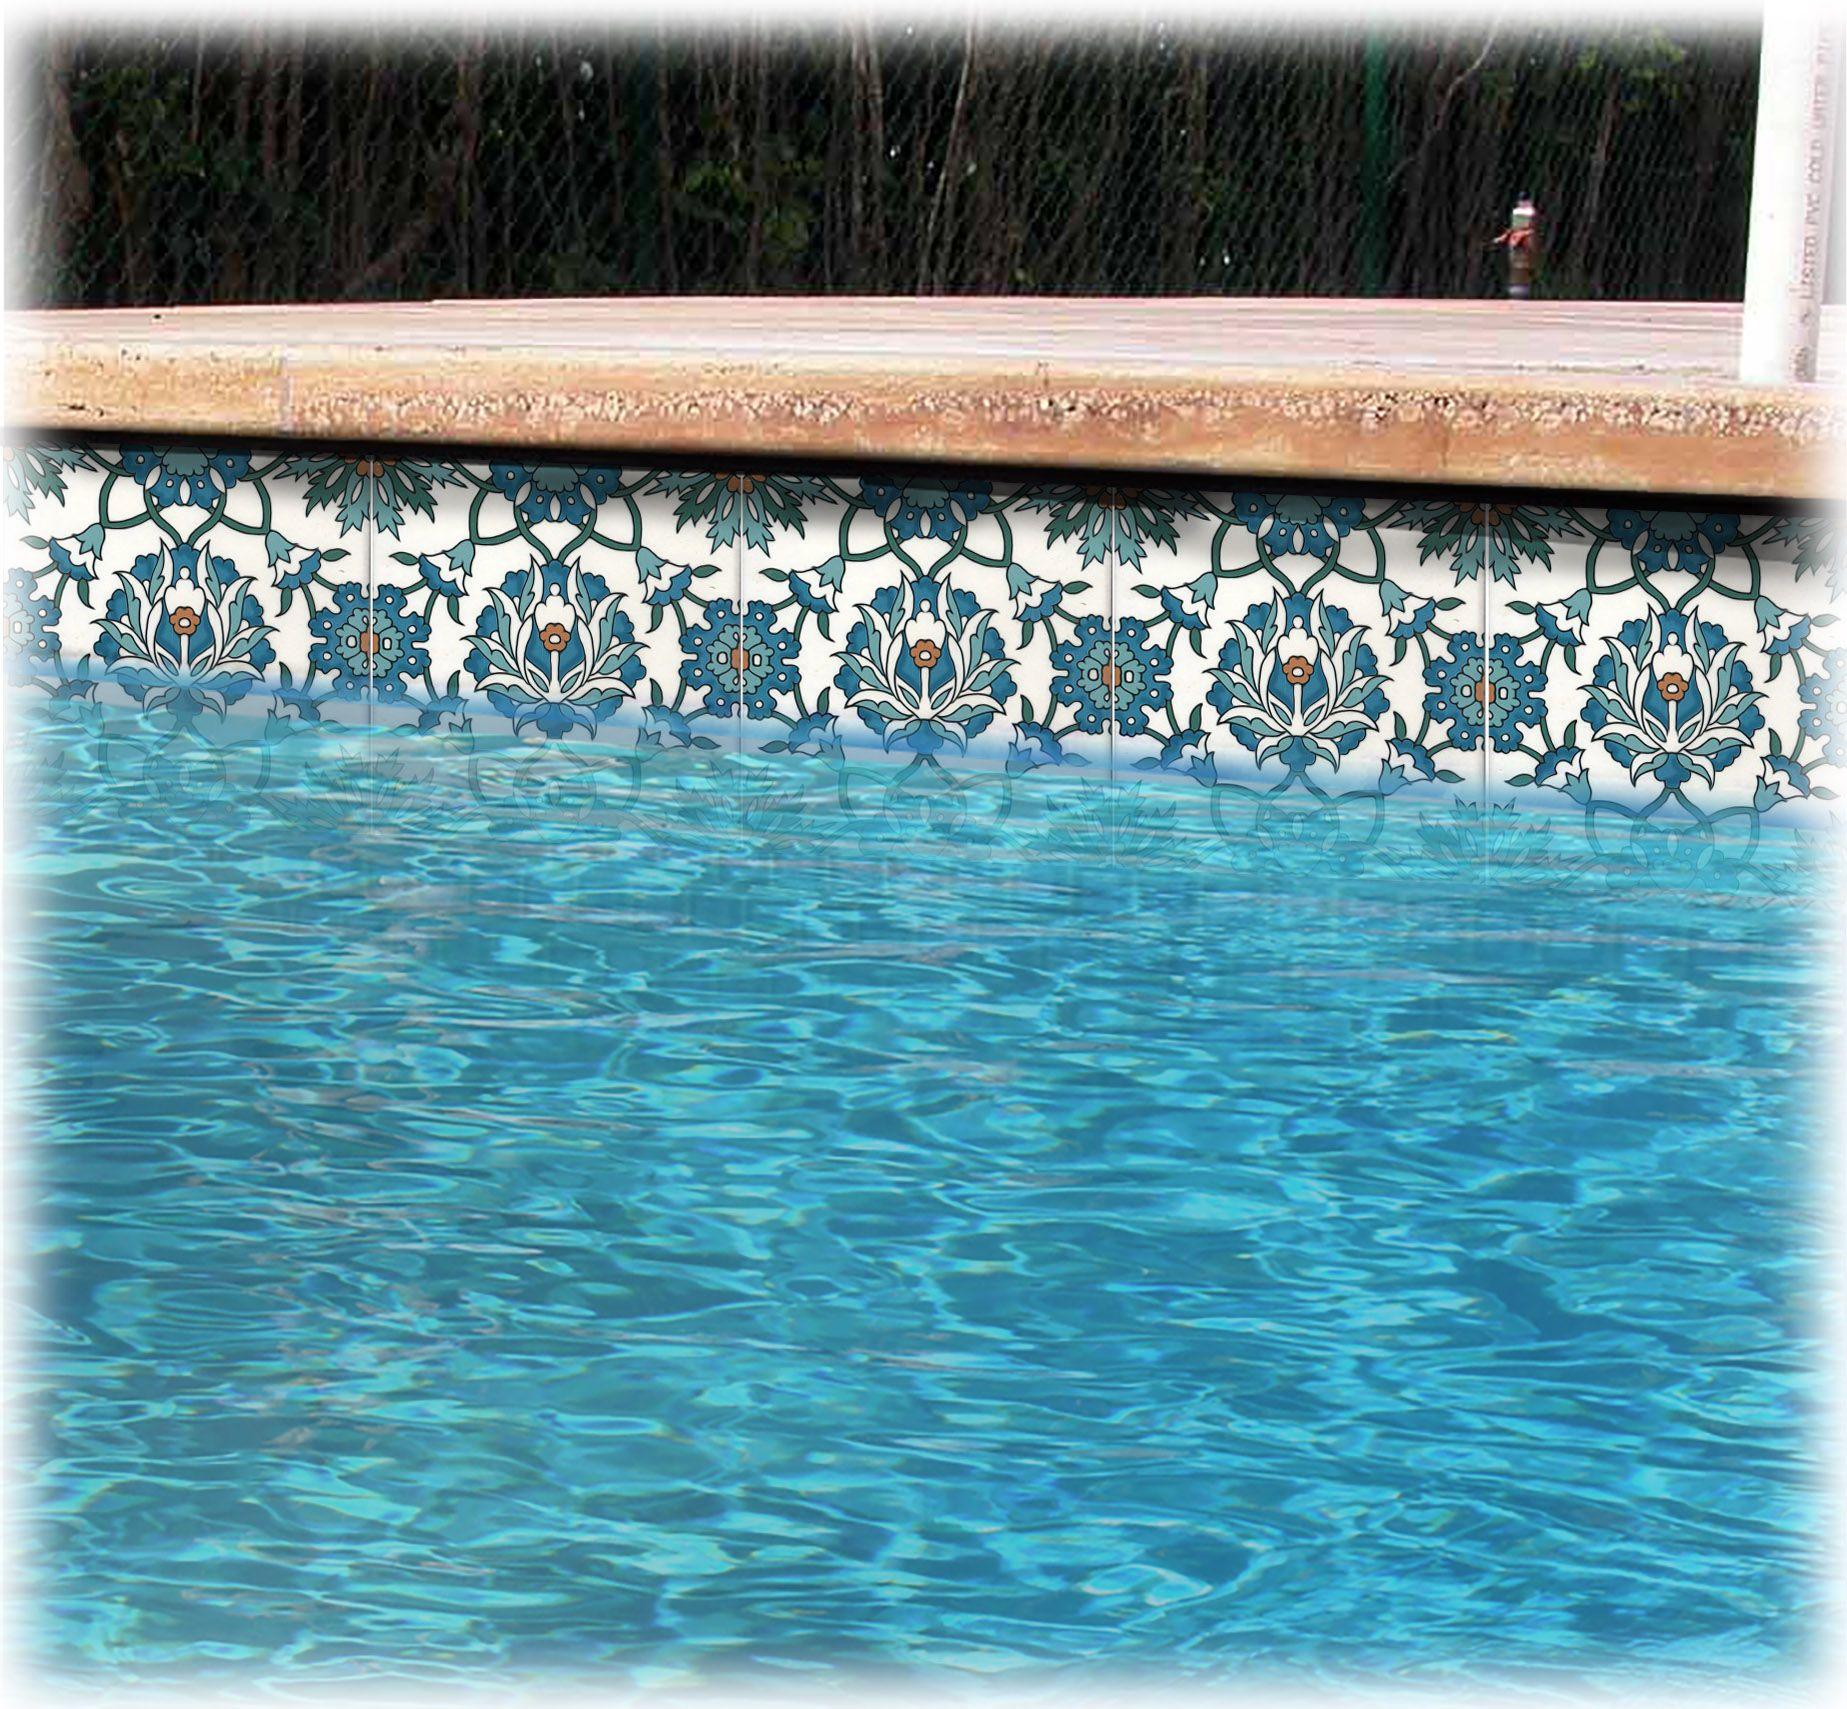 Lori swimming pool tile design liner small size pool in for Pool design pattern